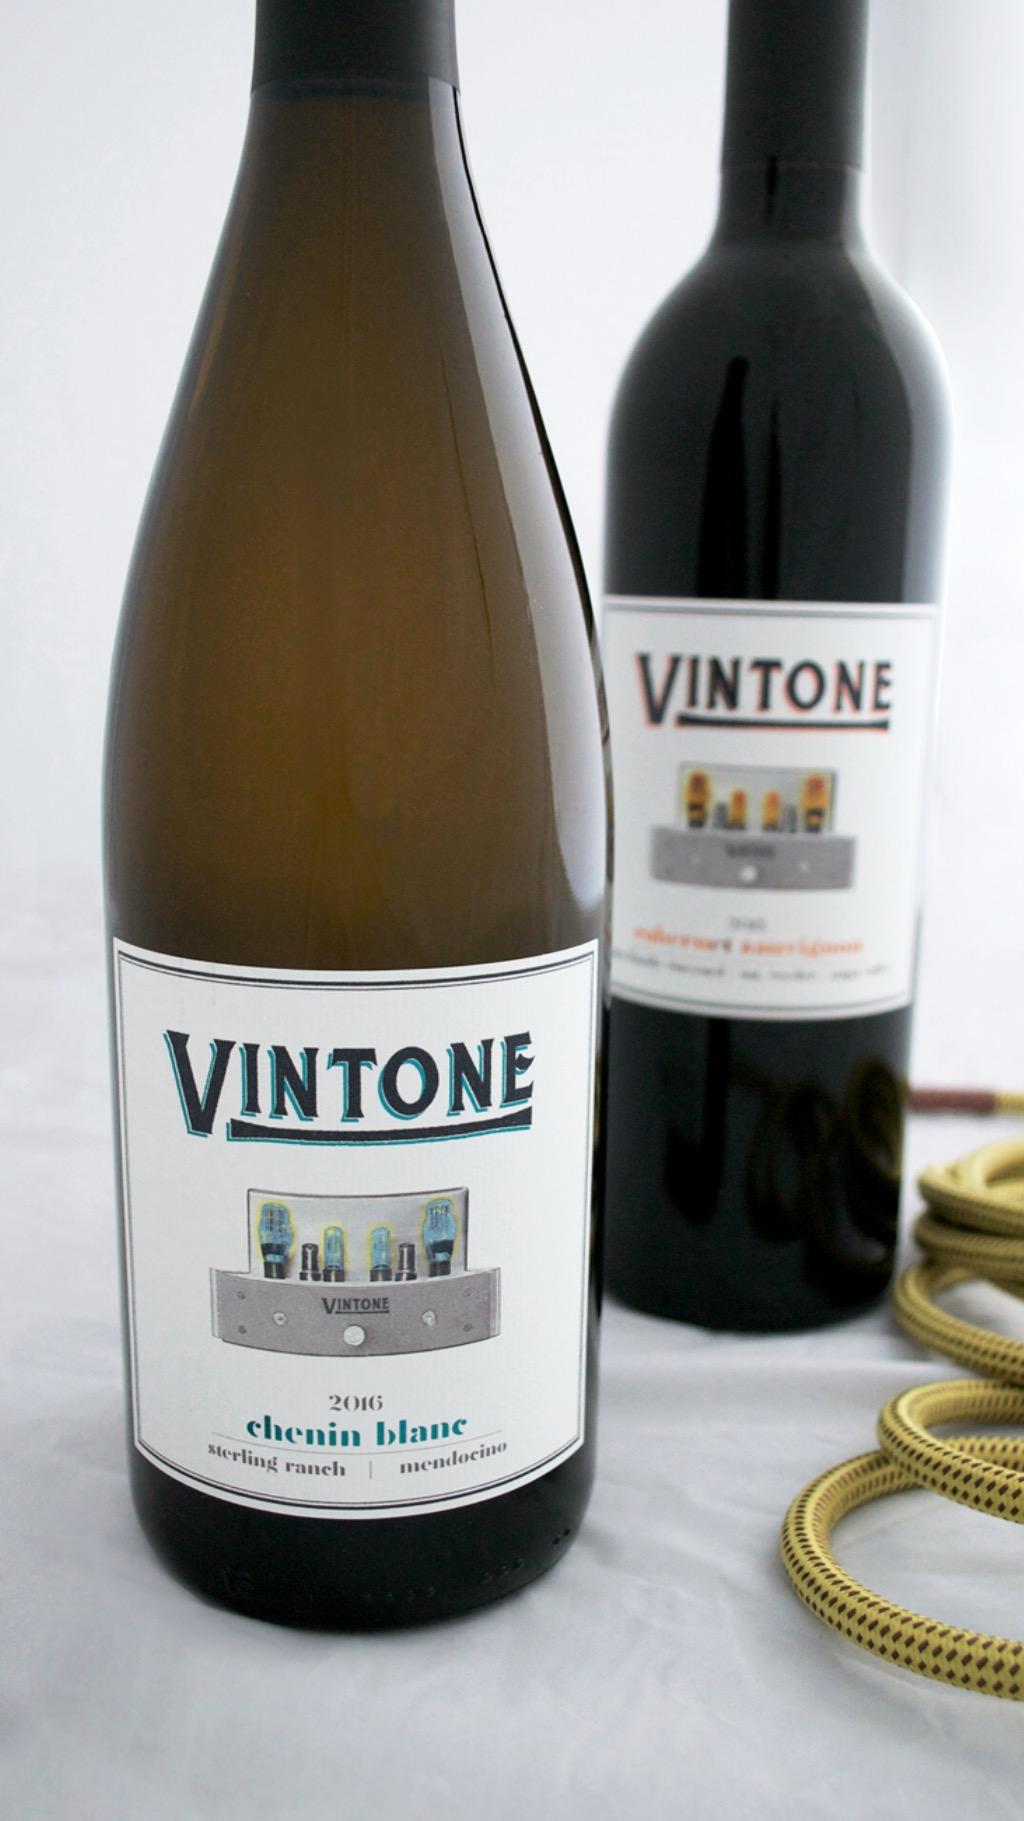 VINTONE Chenin Blanc & Cab. Sauce.